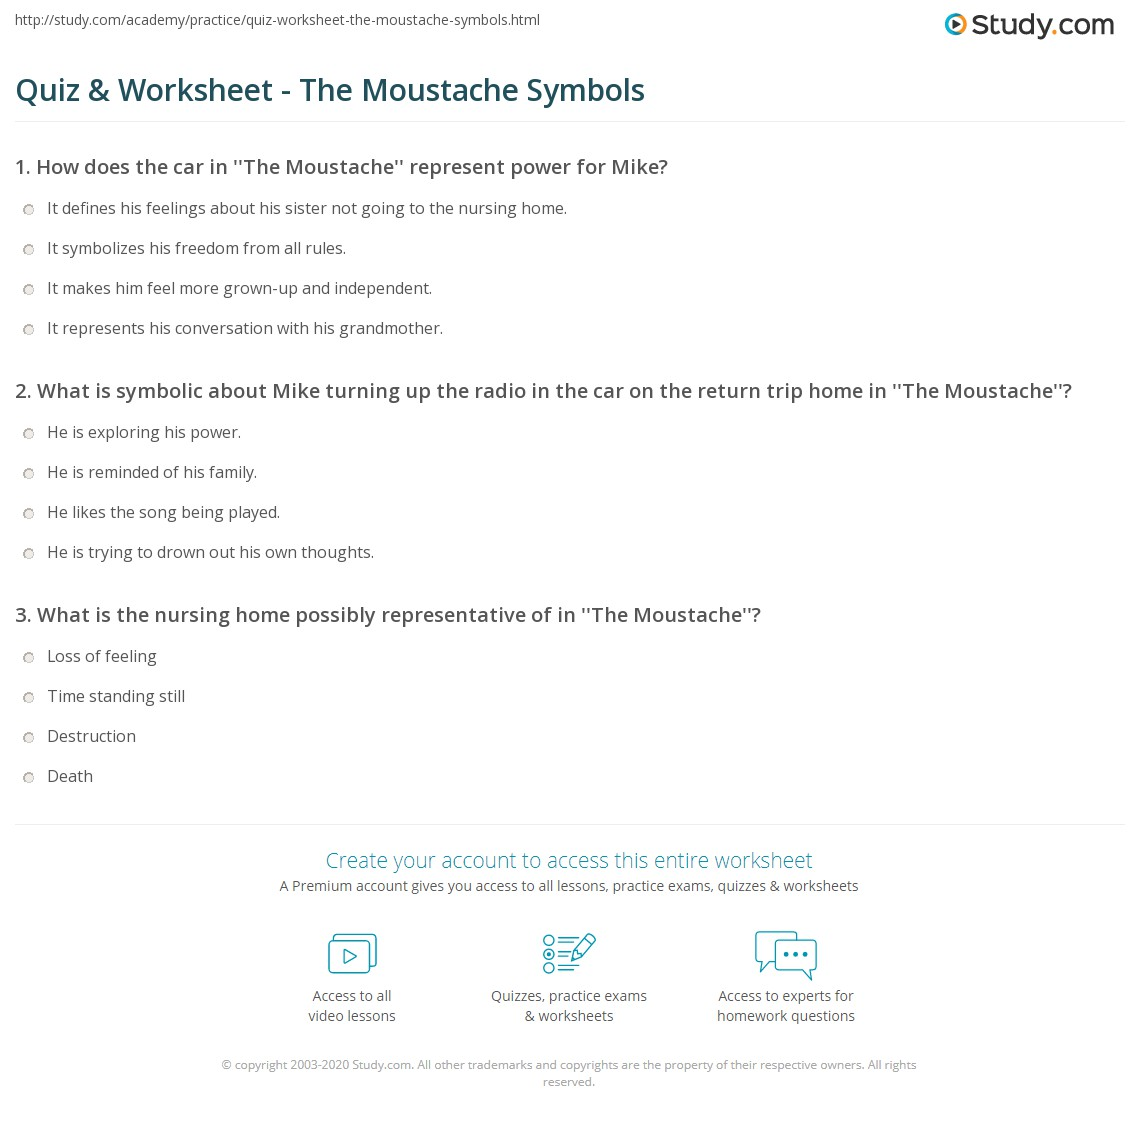 Quiz Worksheet The Moustache Symbols Study